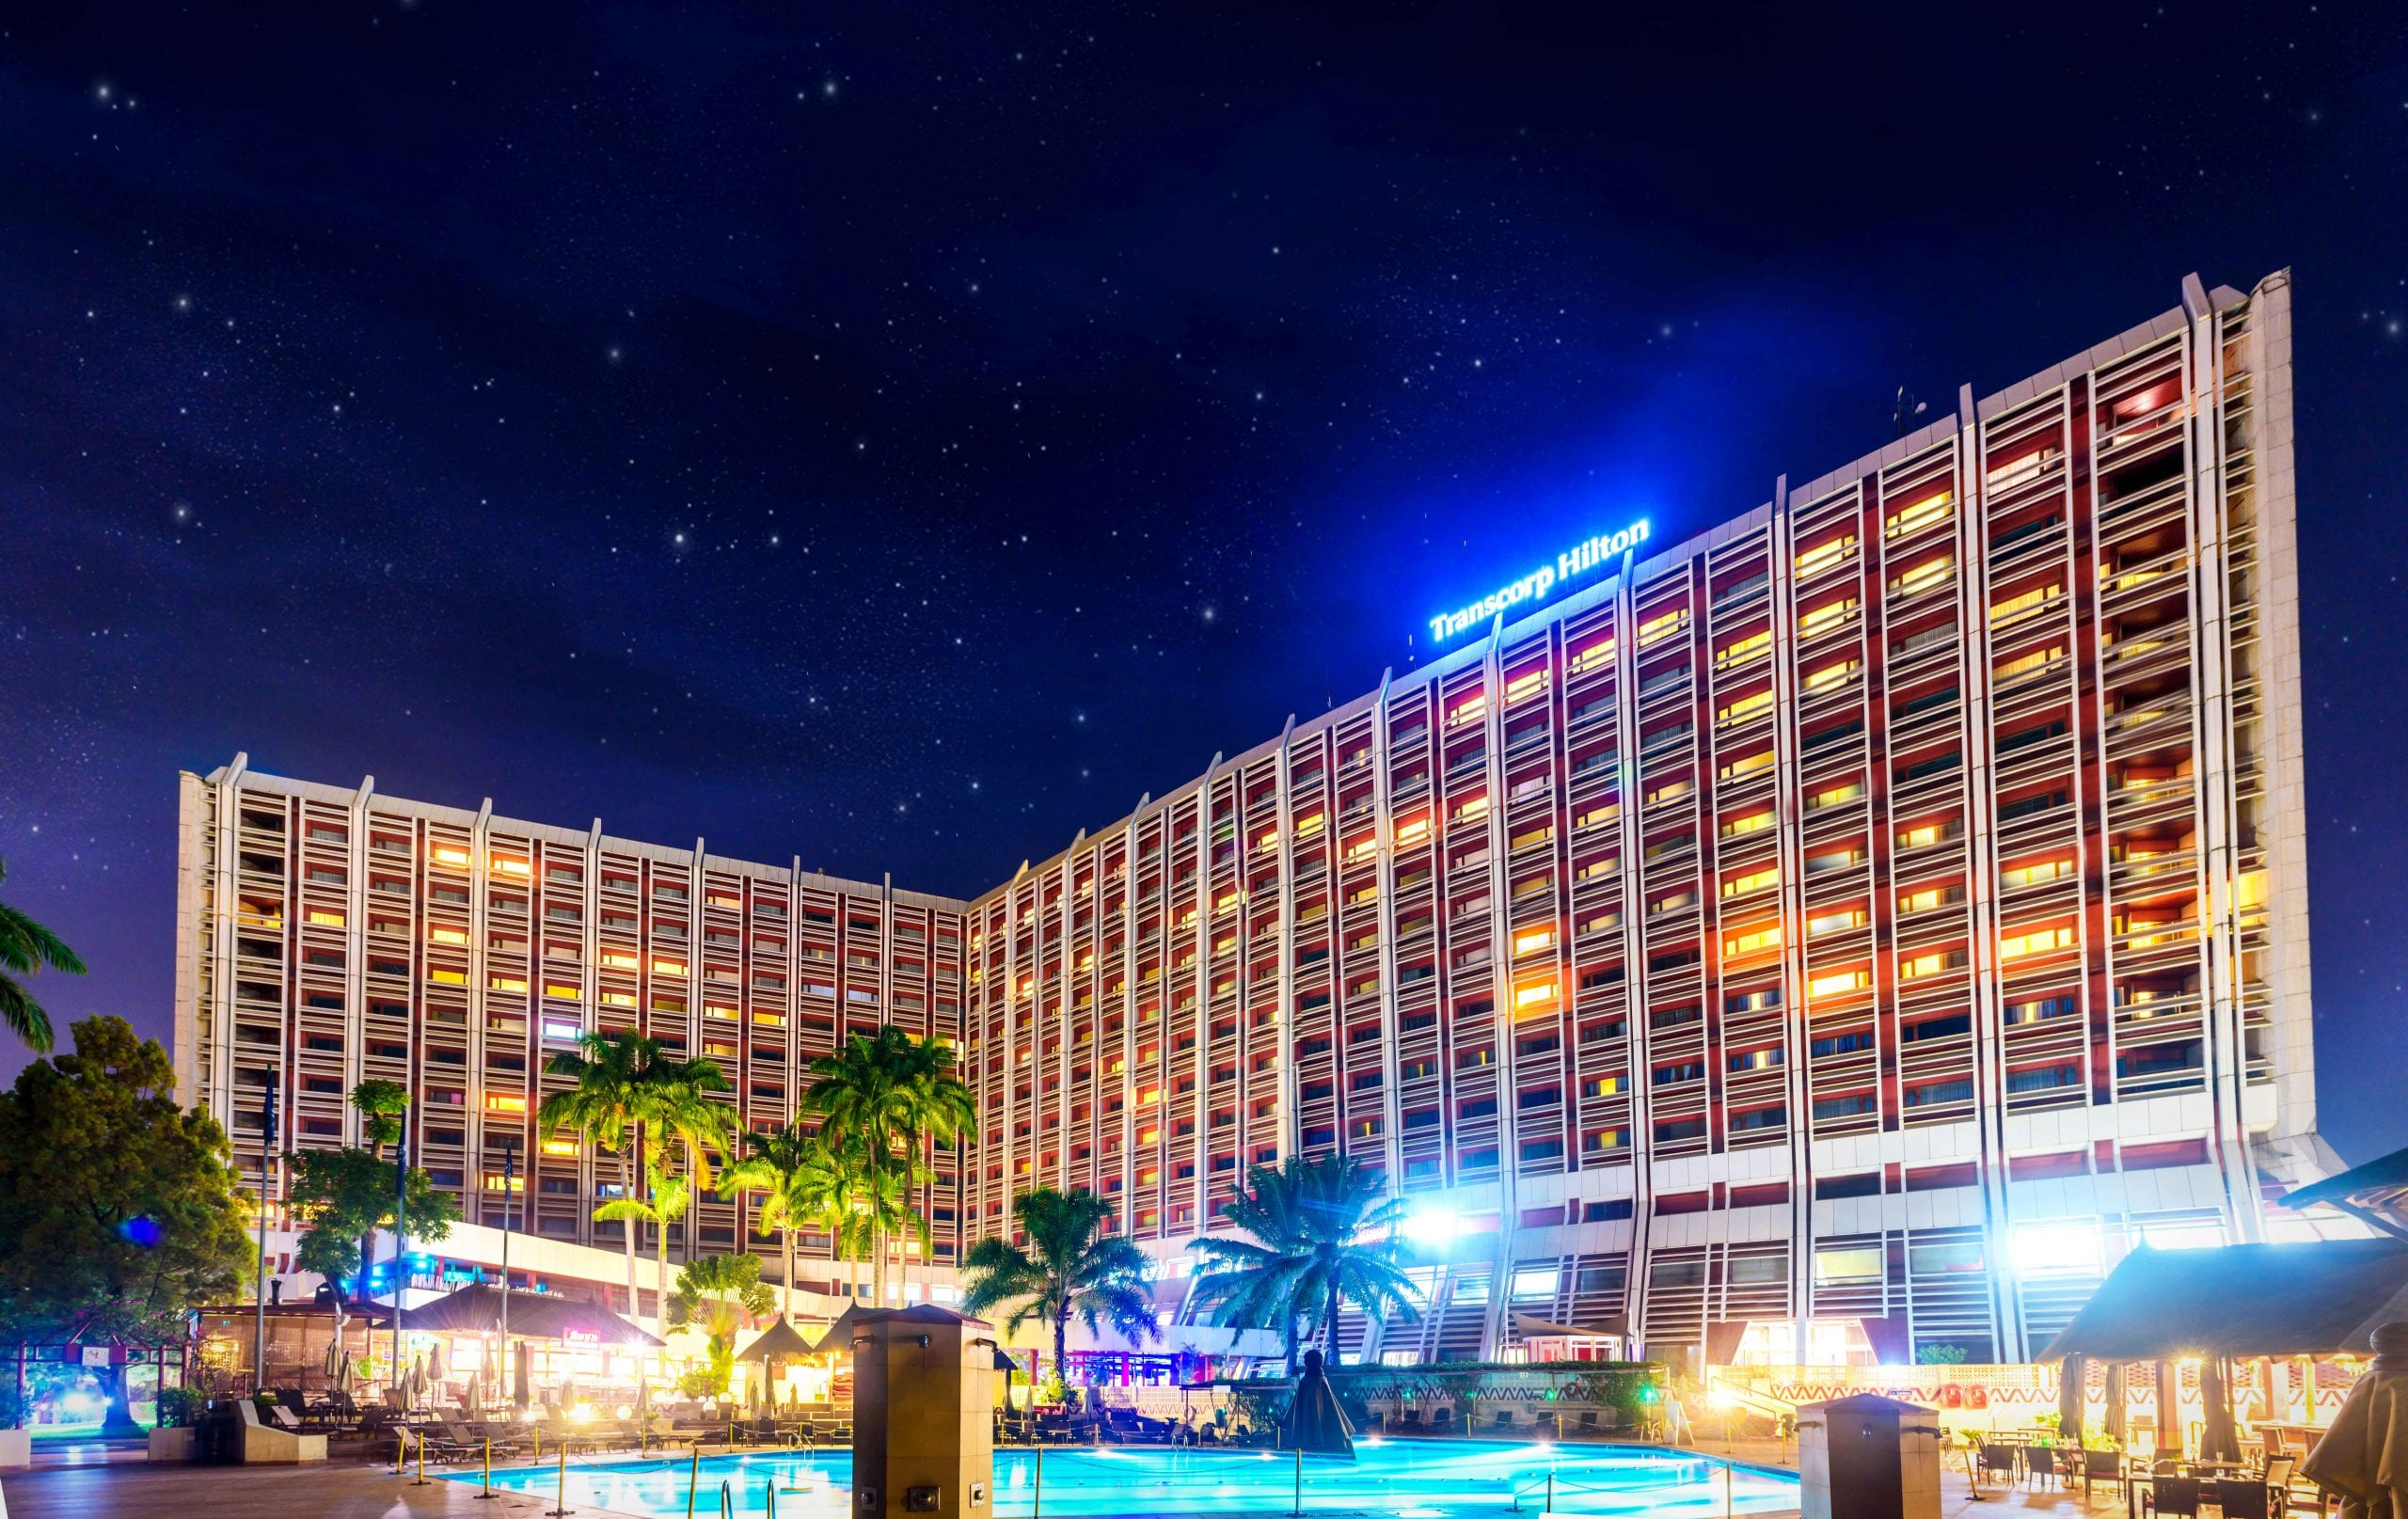 Buildings in Nigeria: 10 Most Beautiful Buildings in Abuja